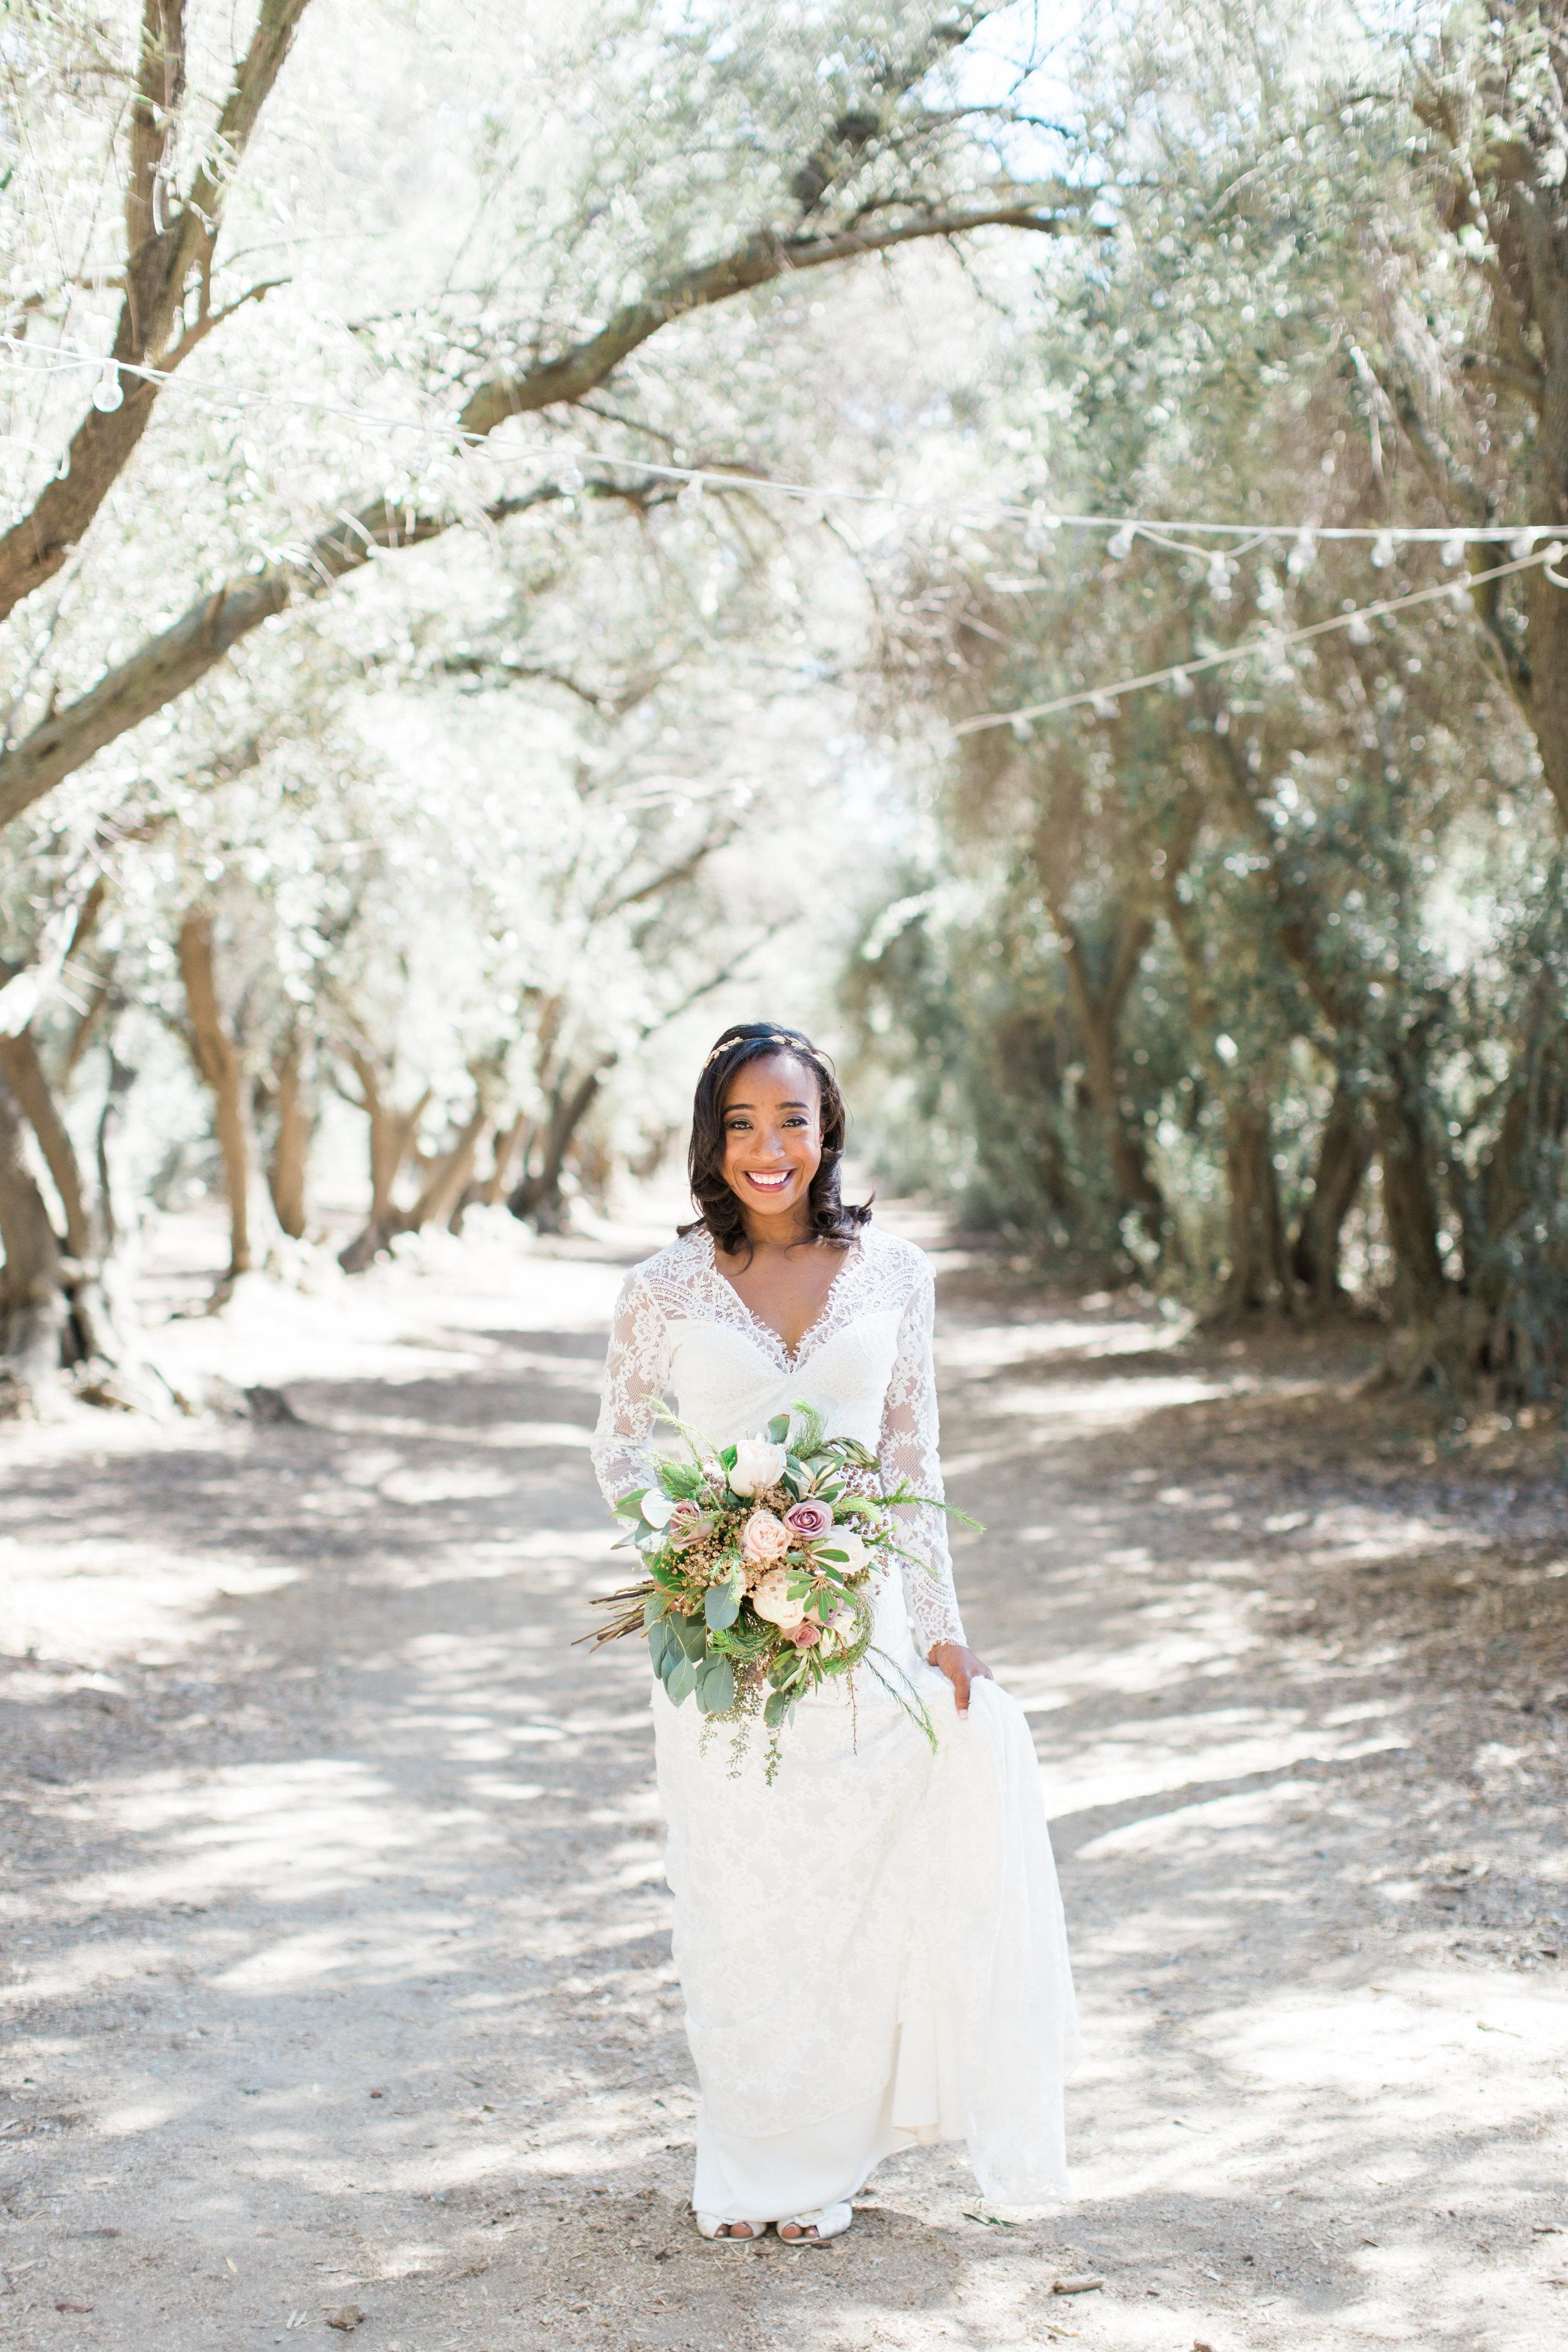 Jenny Quicksall Photography_www.jennyquicksall.com_California Wedding Photographer_Highland Springs Ranch and Inn Resort_Cherry Valley California (16).JPG